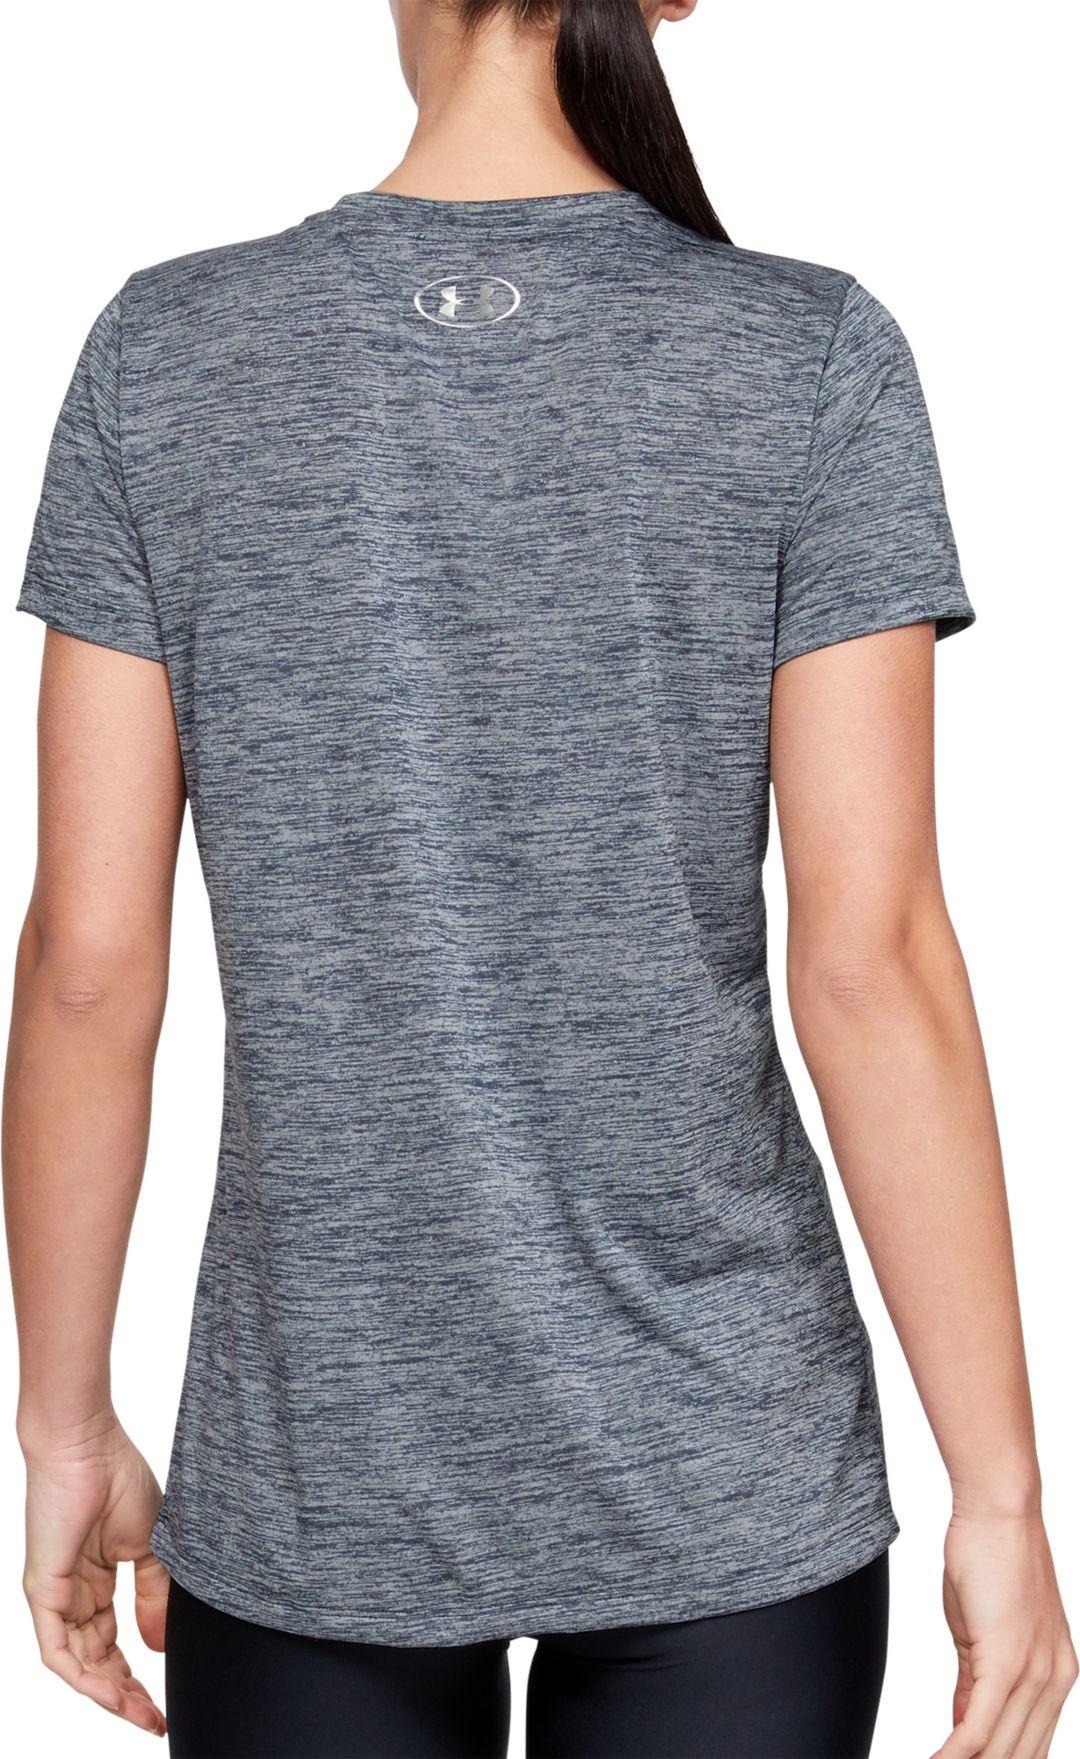 d620c5e1cd Under Armour Women's Tech Twist Print Crewneck T-Shirt